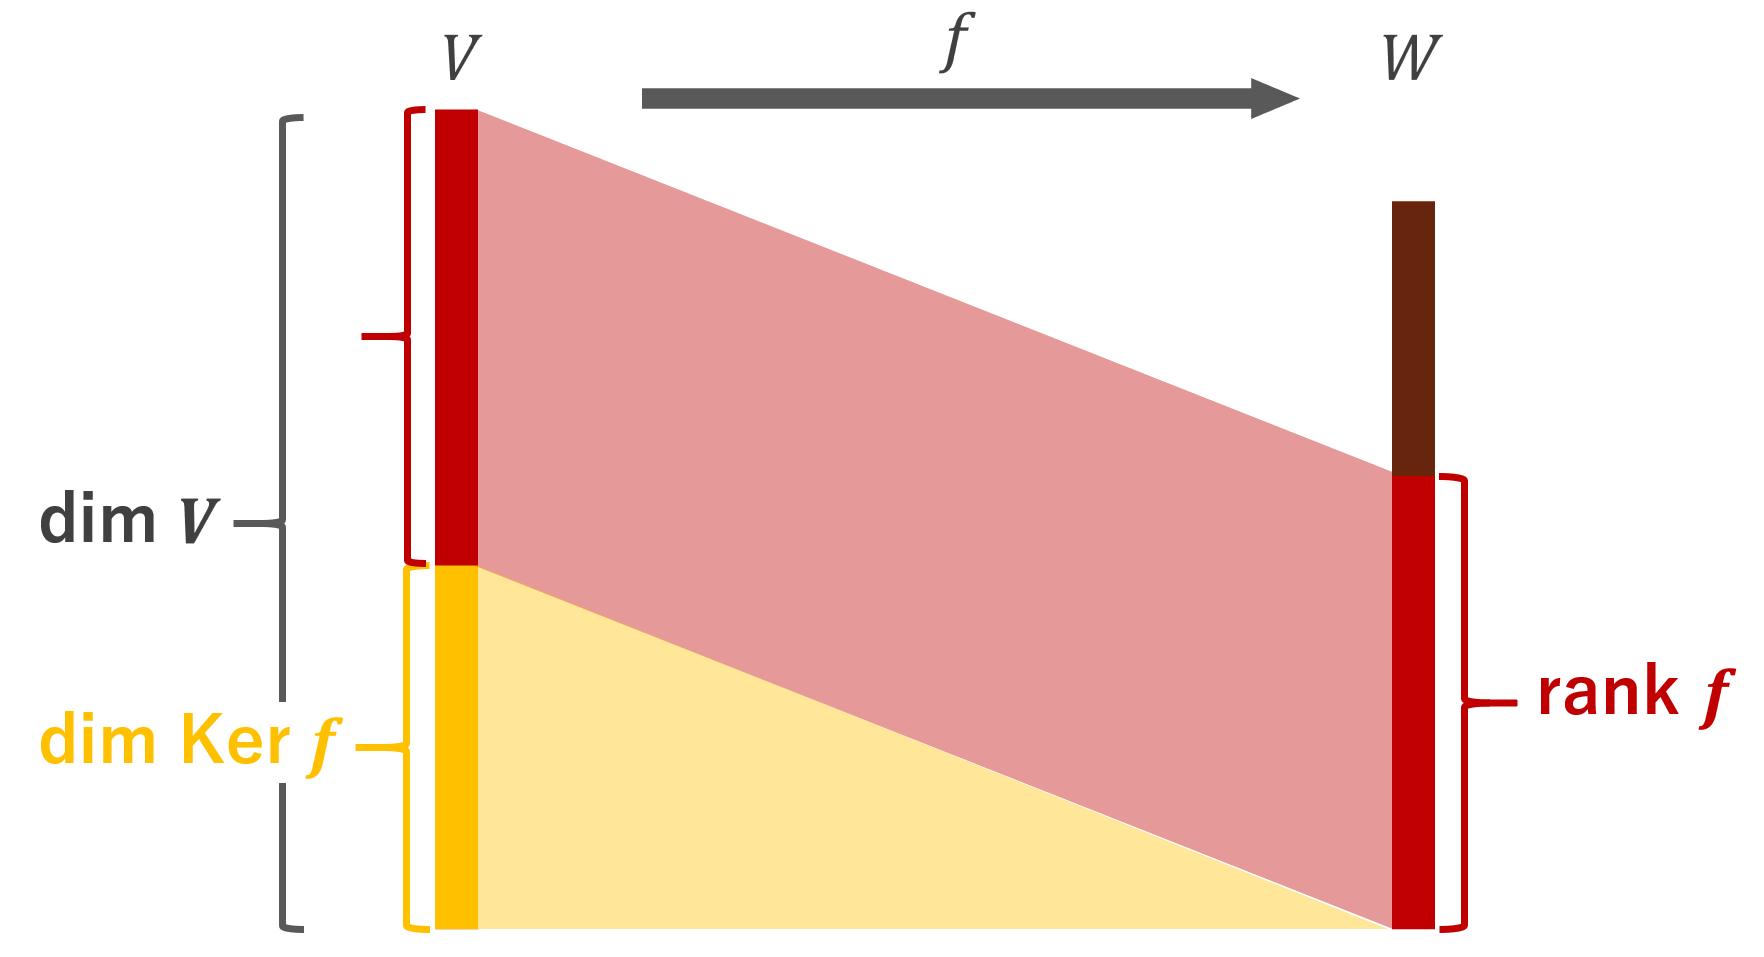 線形写像の次元等式dim V = rank f + dim ker fの証明